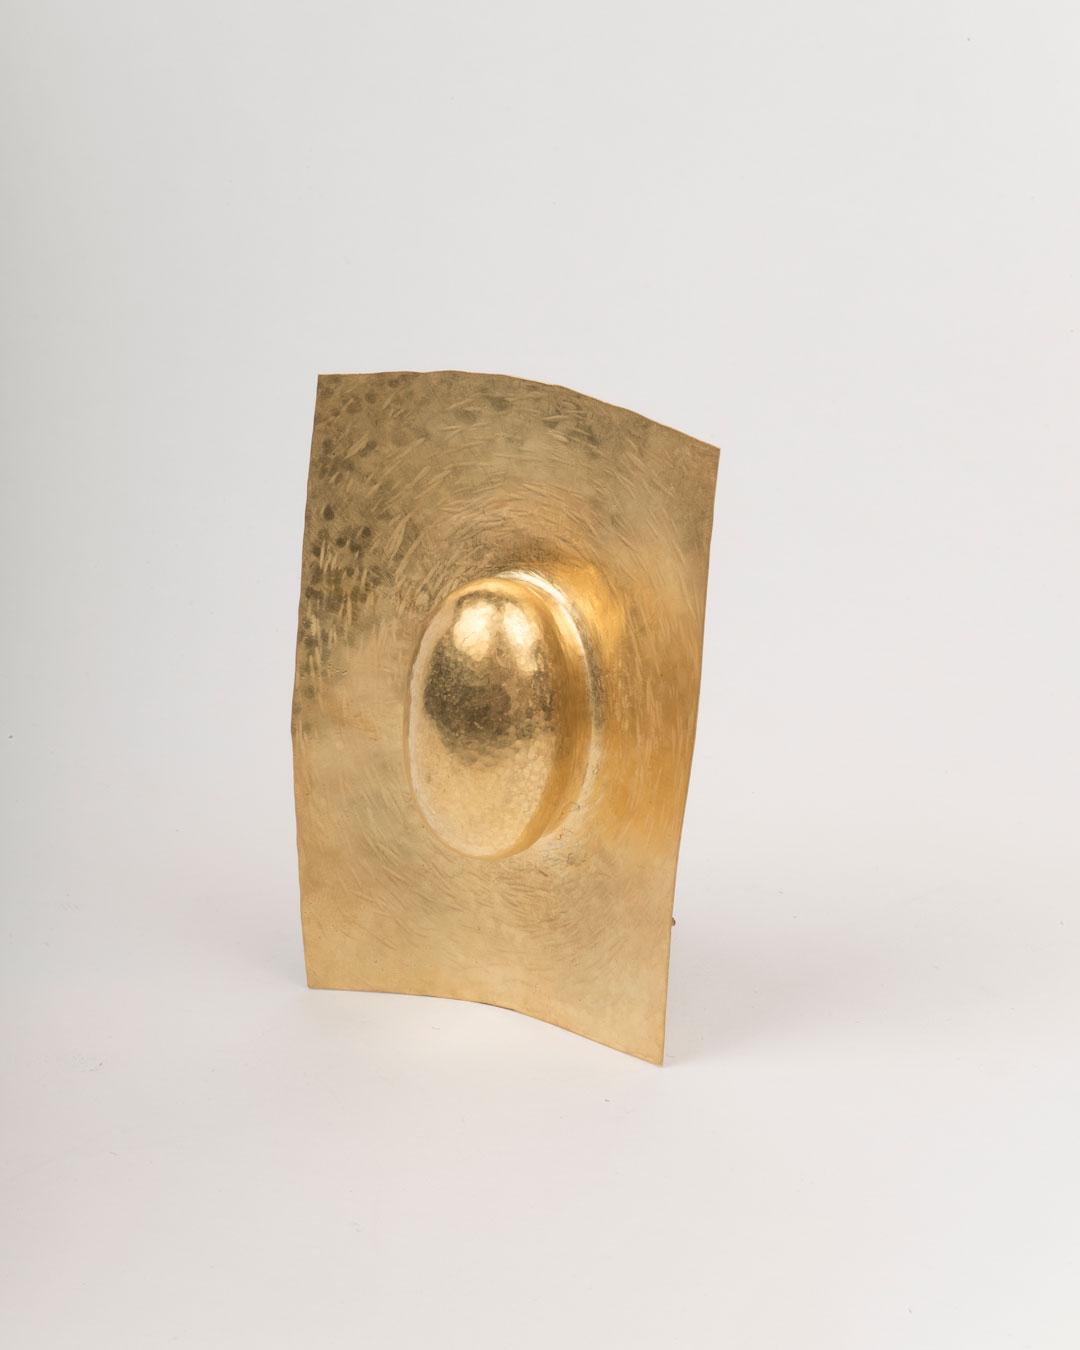 Francesco Pavan, untitled, 2018/2019, brooch; gold, 115 x 85 x 35 mm, price on request